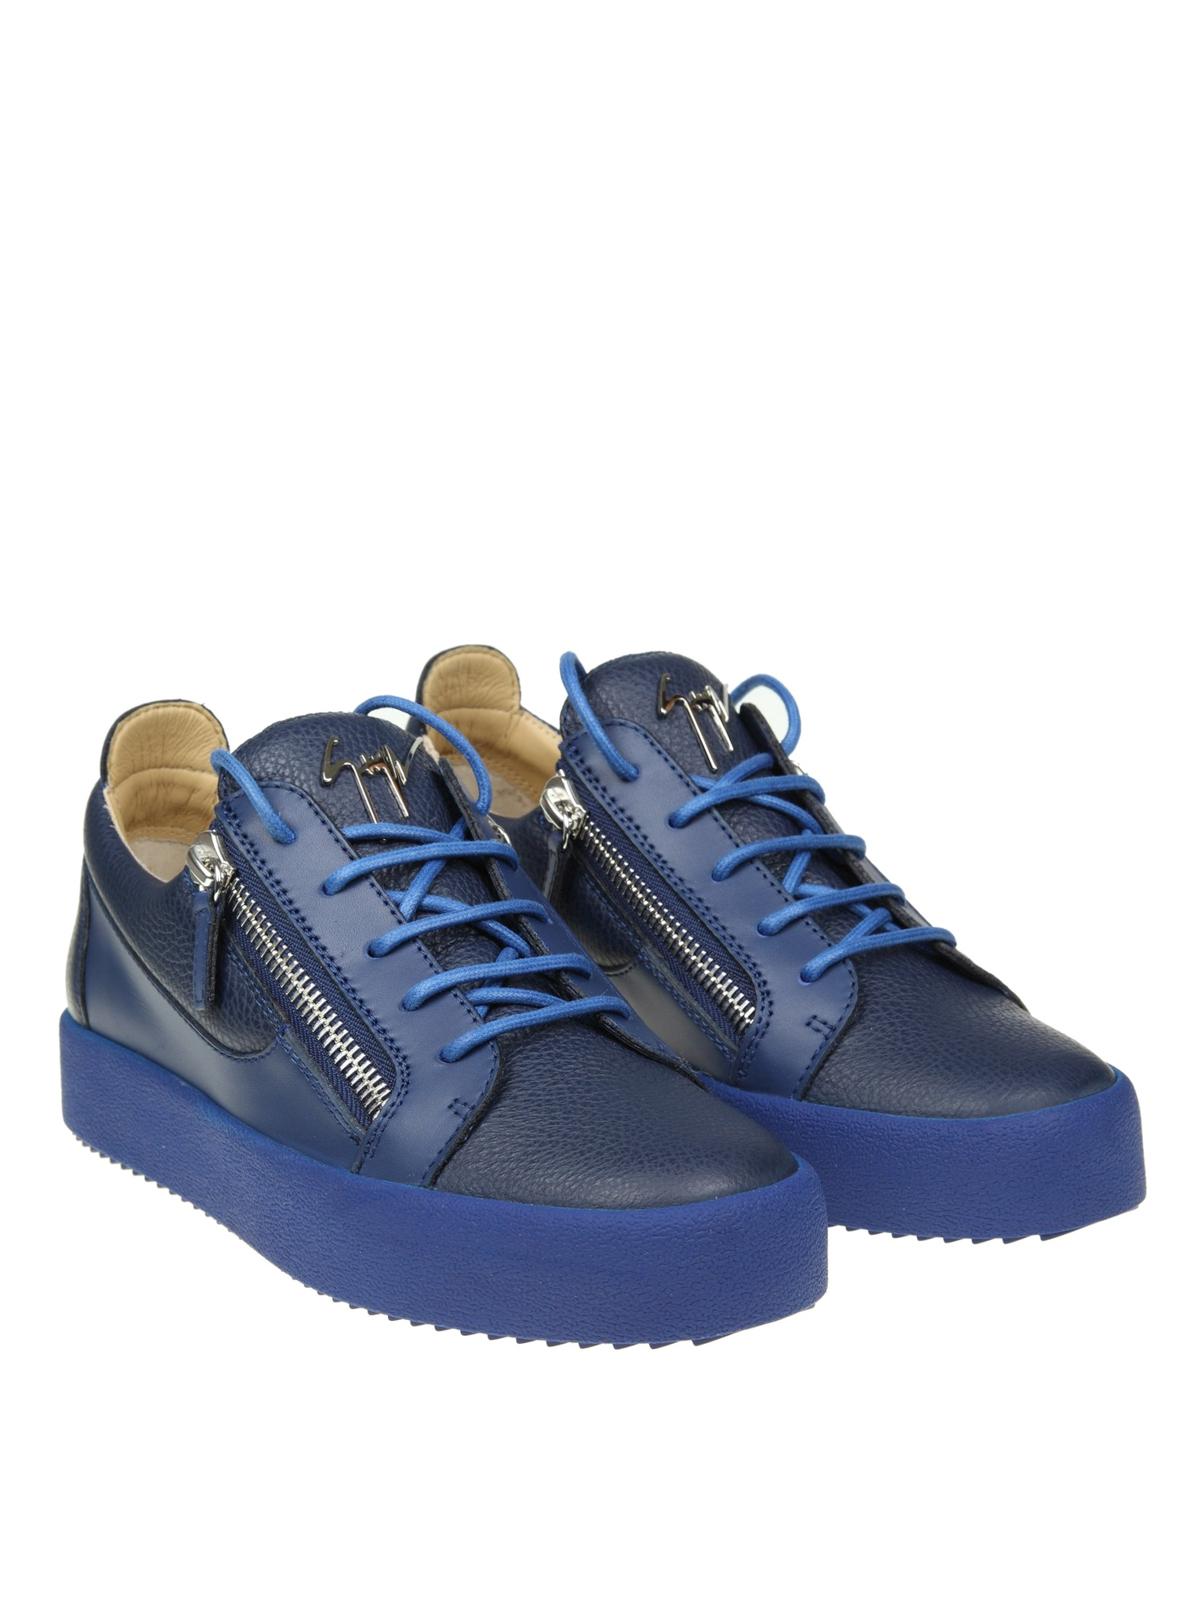 Ru70000 Zanotti Baskets Sport Chaussures Frankie Giuseppe 052 De YP4q1wp